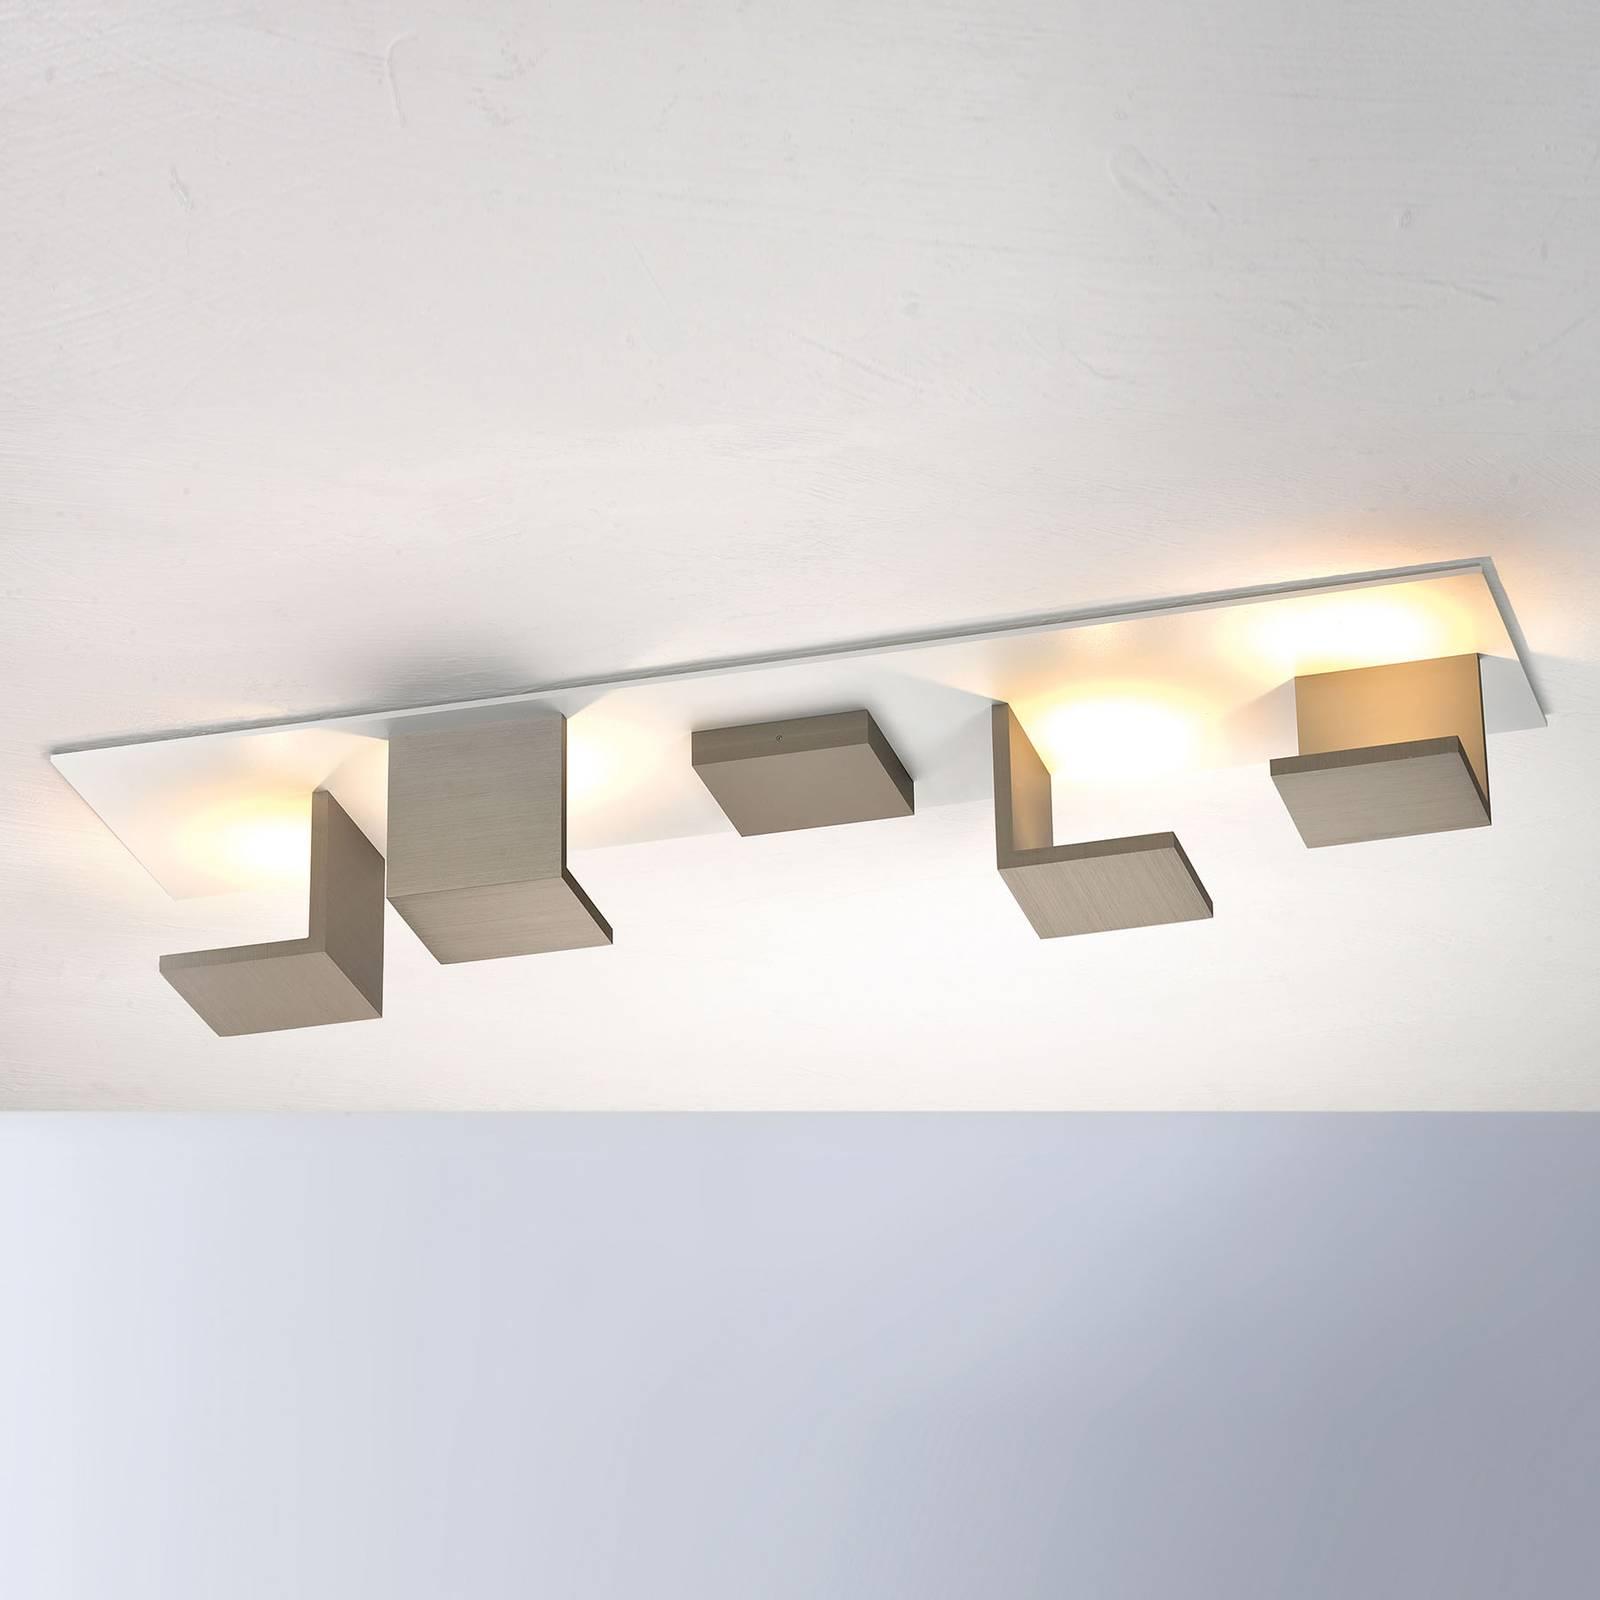 Bopp Reflections lampa sufitowa długa biała/taupe